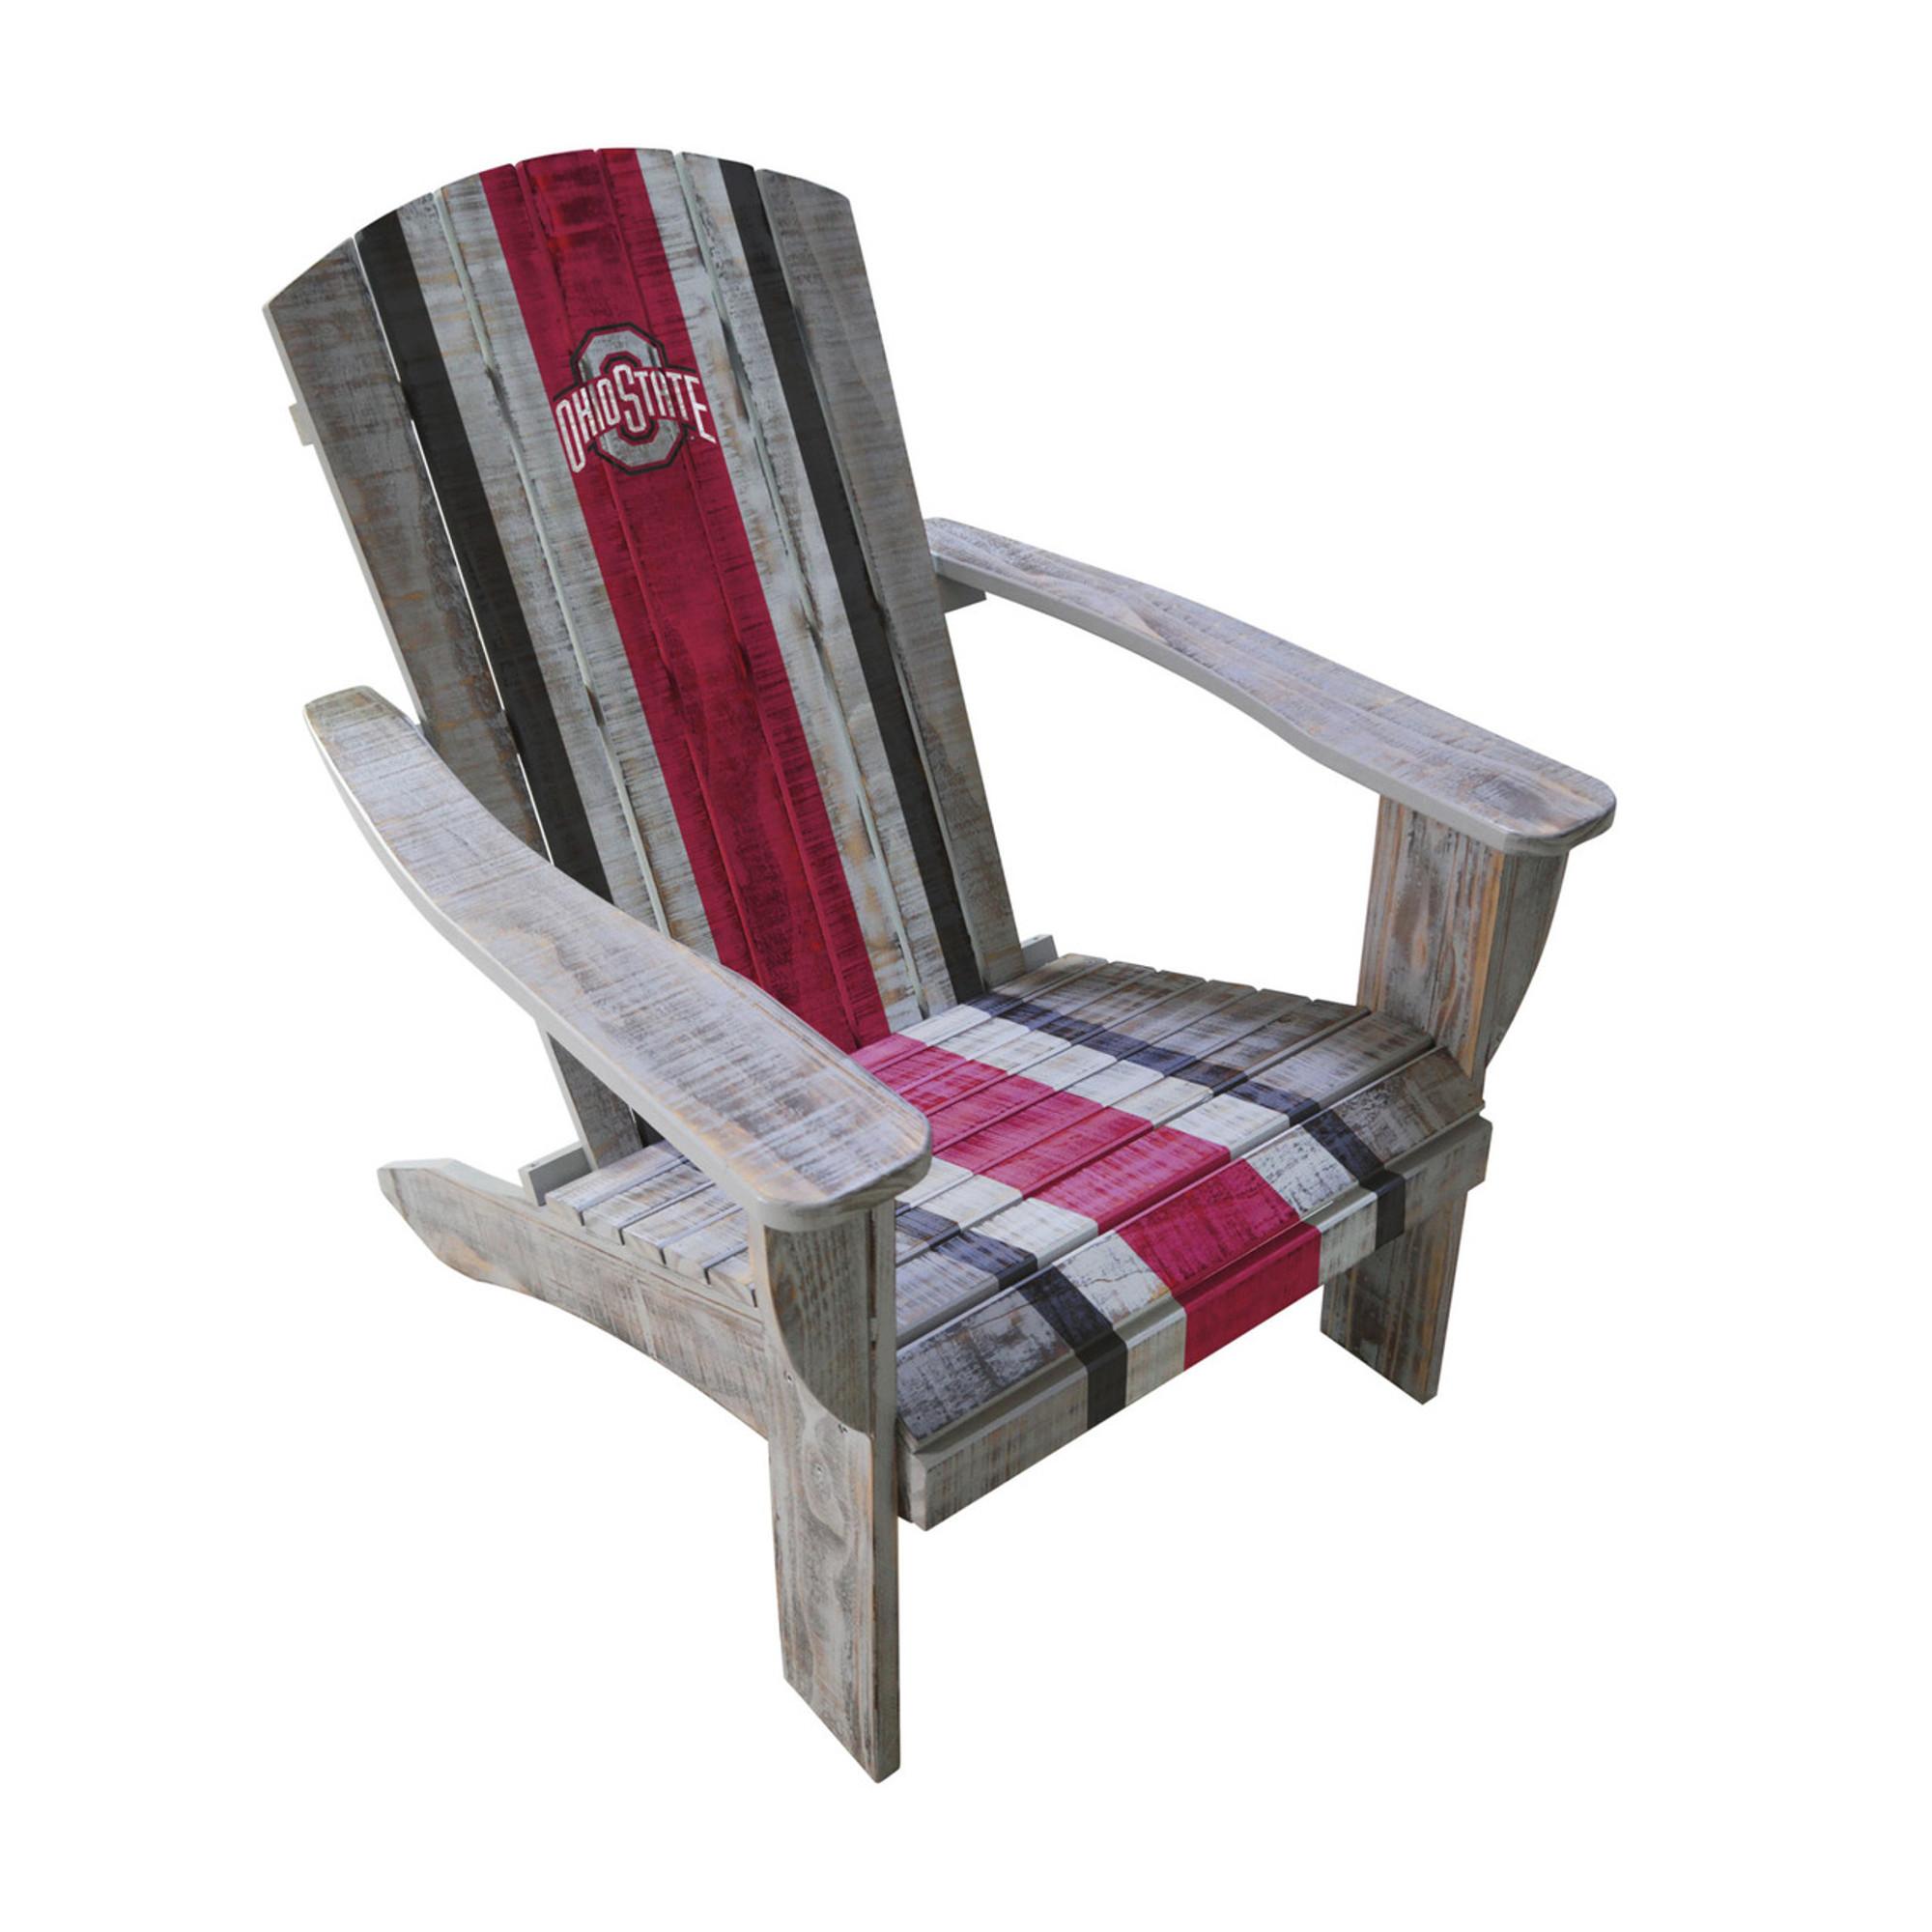 Ohio State Buckeyes Wooden Adirondack Chair | Imperial International | 711-7015  sc 1 st  College Logo Stuff & Ohio State Buckeyes Wooden Adirondack Chair